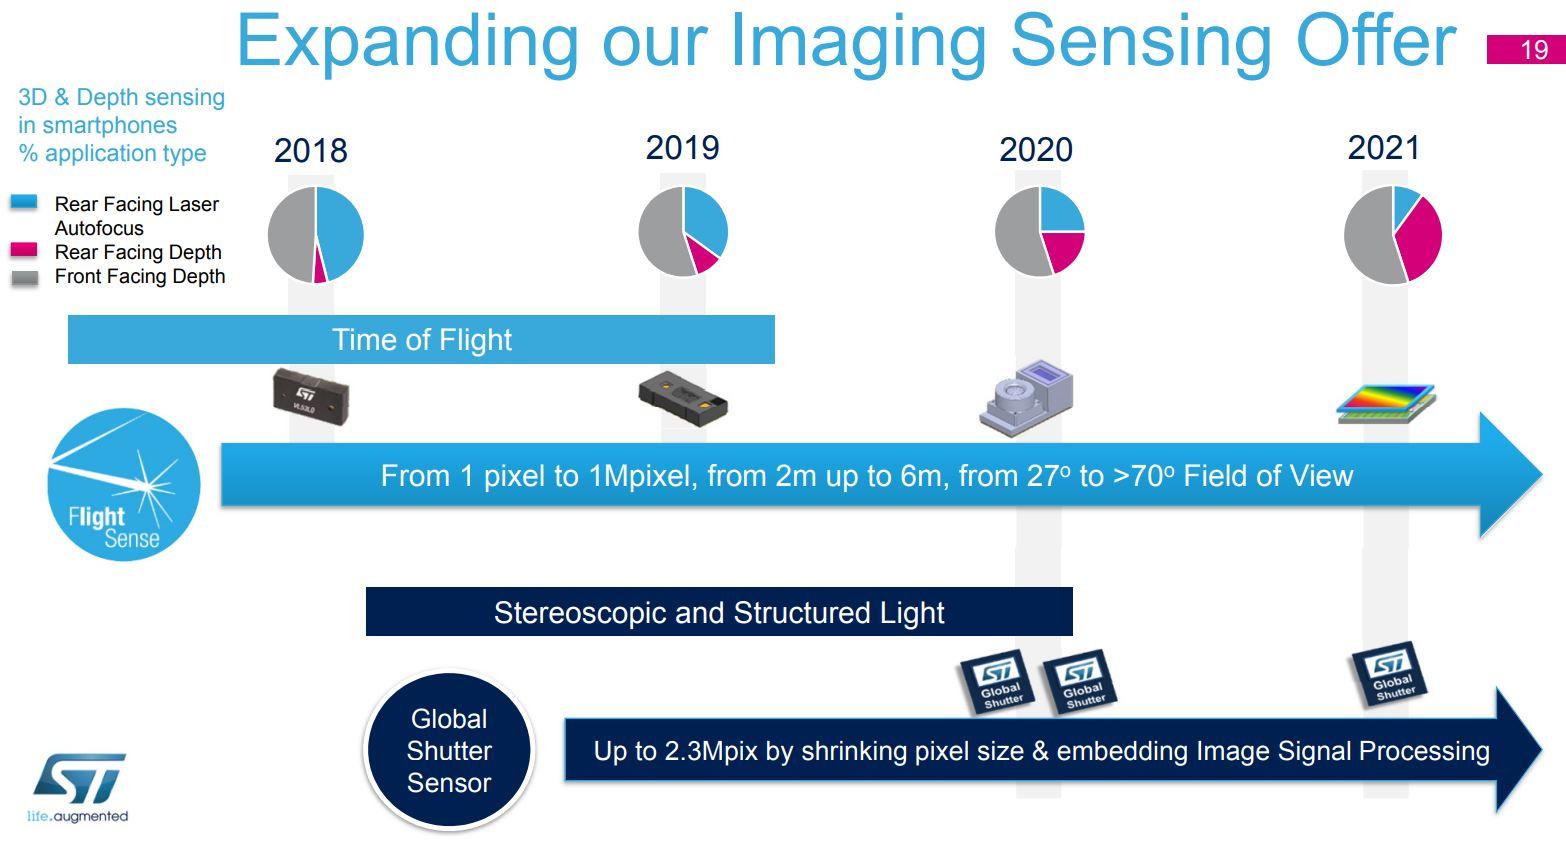 Image Sensors World: ST Imaging Roadmap